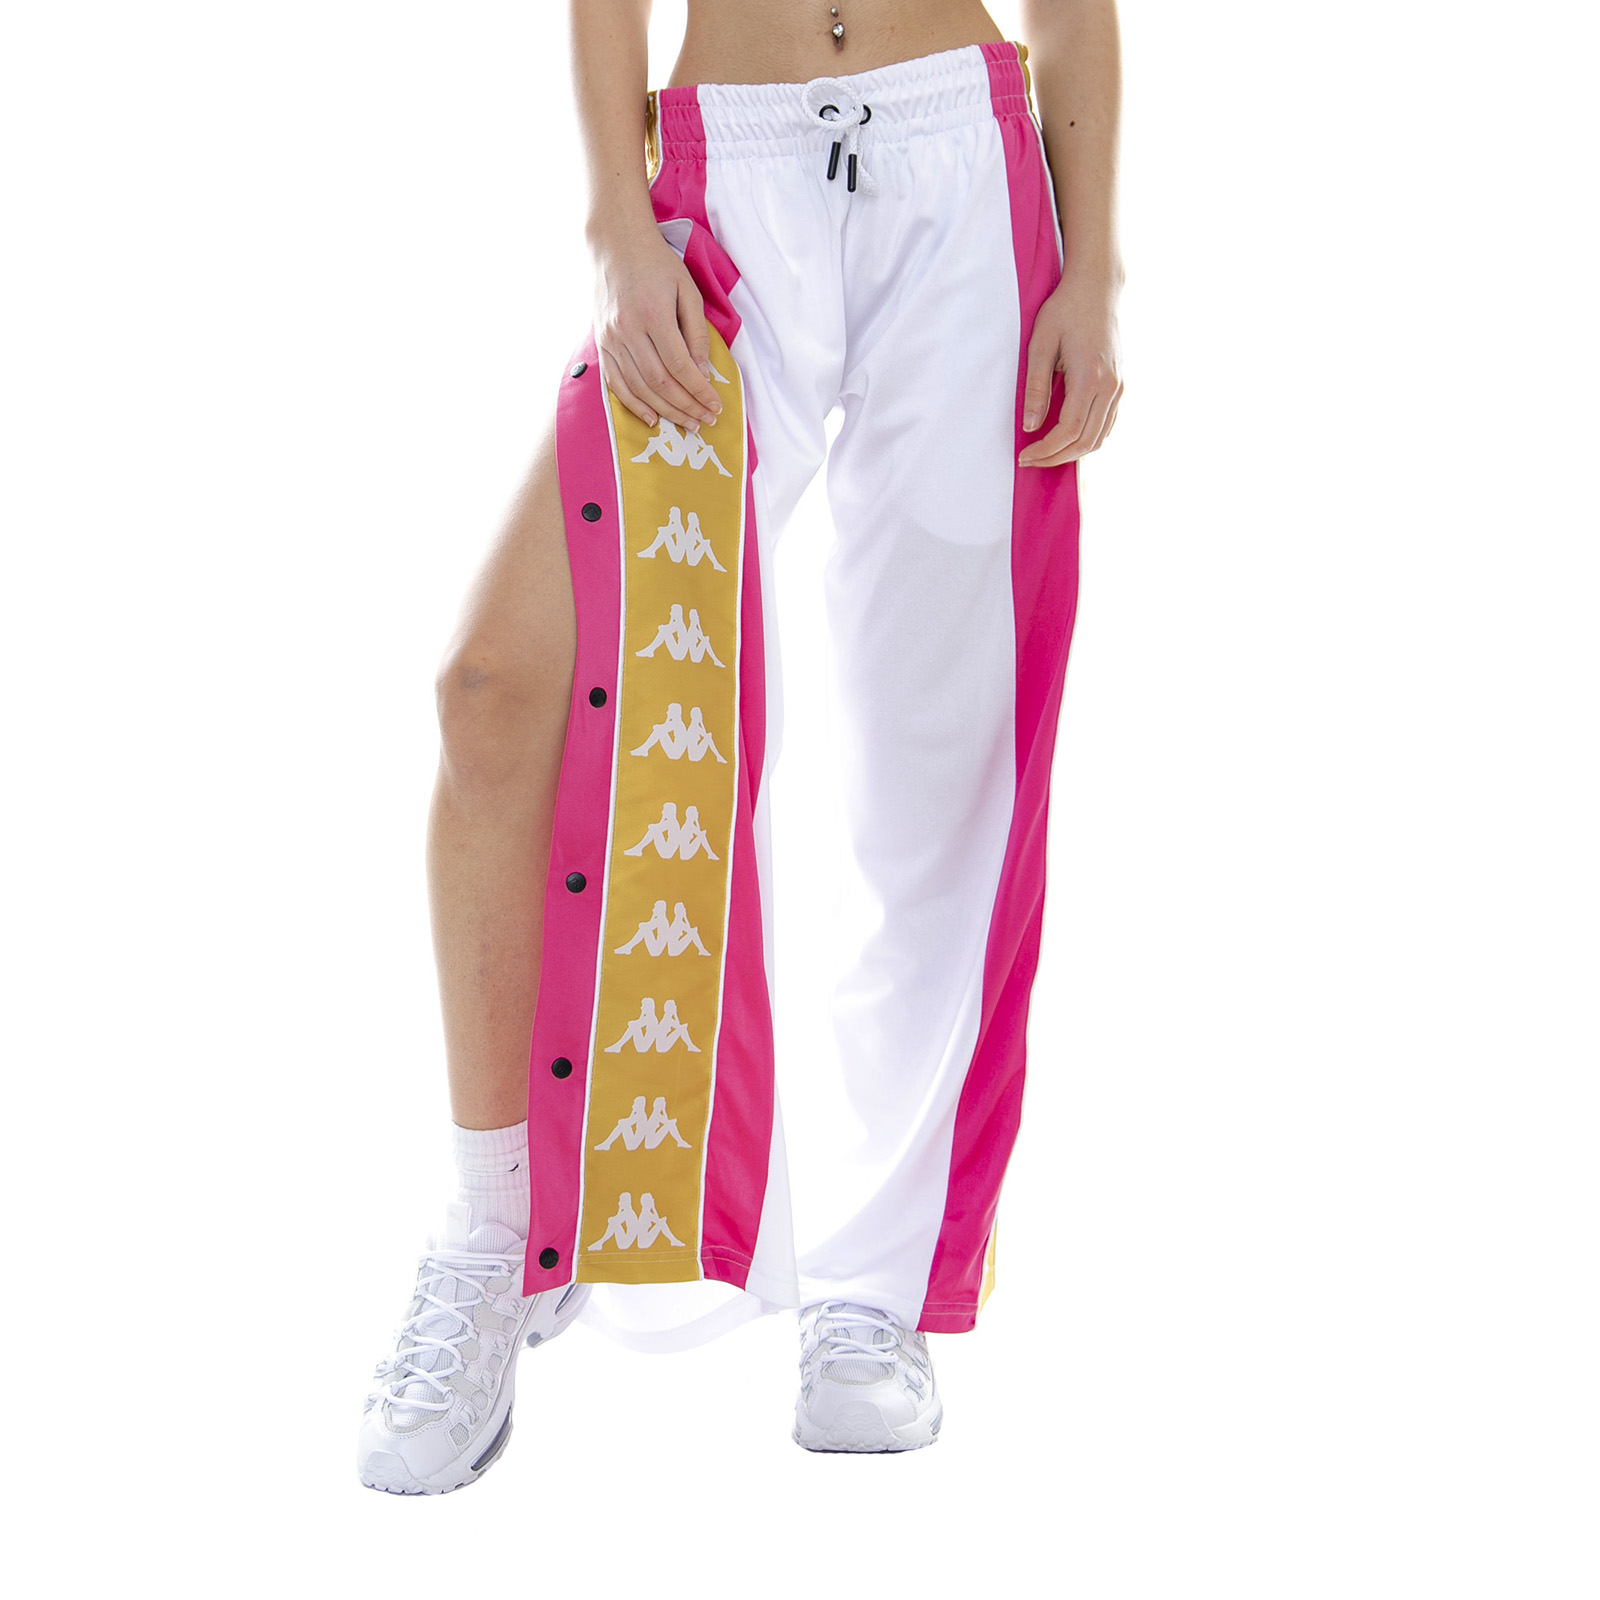 c0046ff2484c Kappa 222 Banda Baish White/Fuchsia/Yellow - Pantaloni Sportivi Da Donna  Bianco 4 4 di 4 Vedi Altro